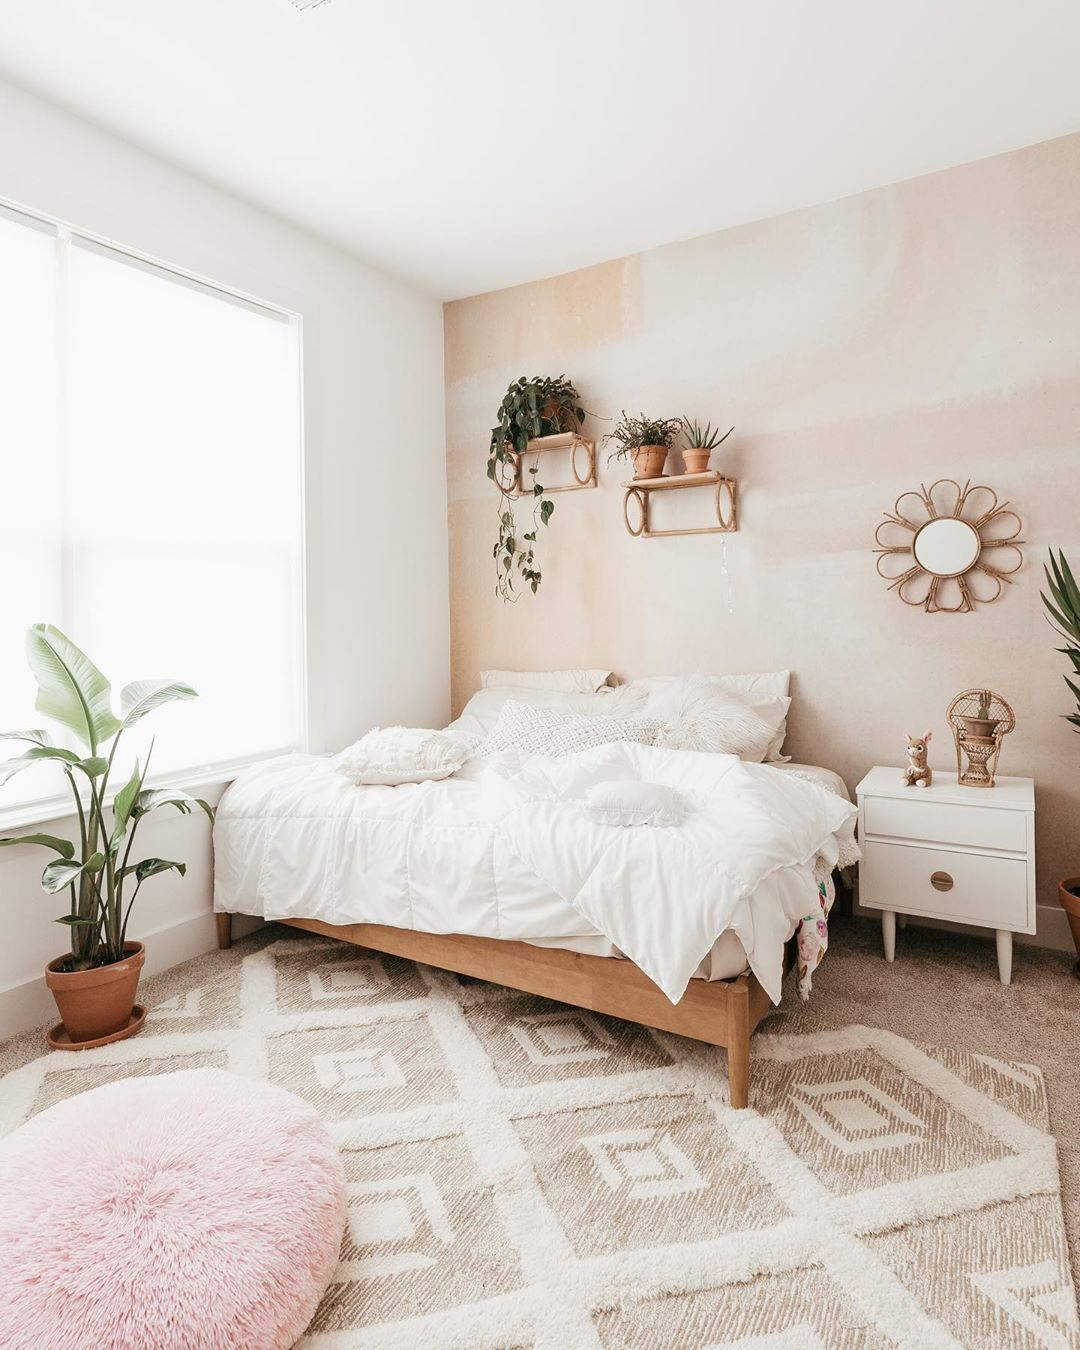 Future Home Interior SHYLA CINO on Instagram I took a